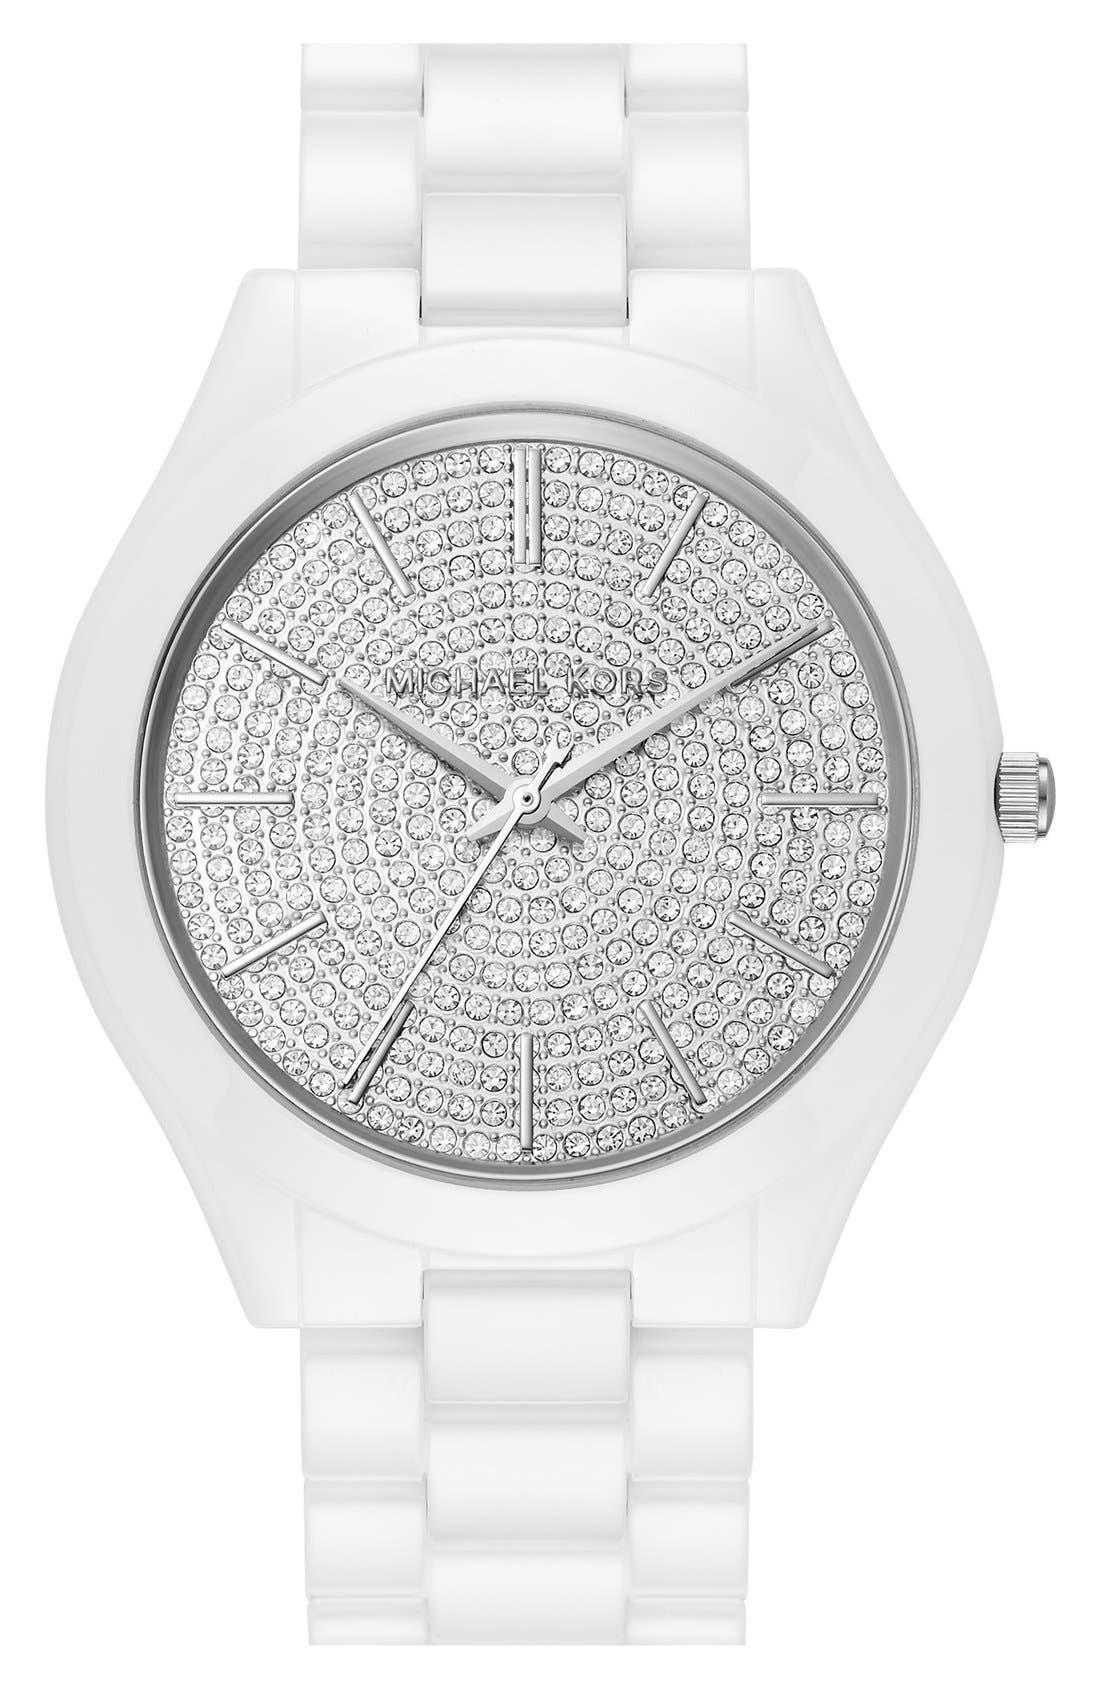 Main Image - Michael Kors 'Slim Runway' Pavé Dial Ceramic Bracelet Watch, 42mm